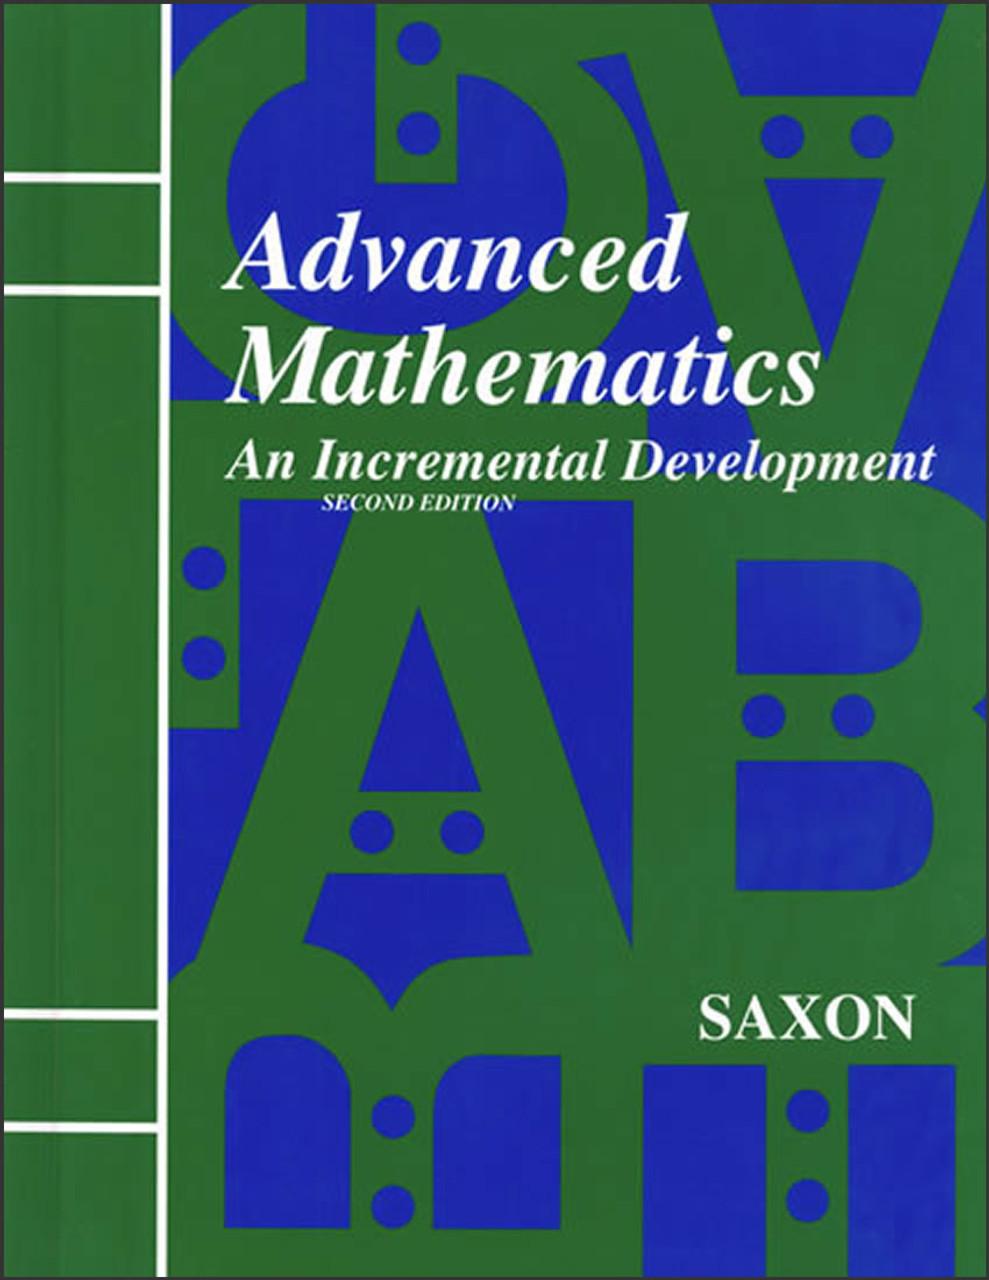 Saxon Advanced Mathematics: An Incremental Development, 2nd edition